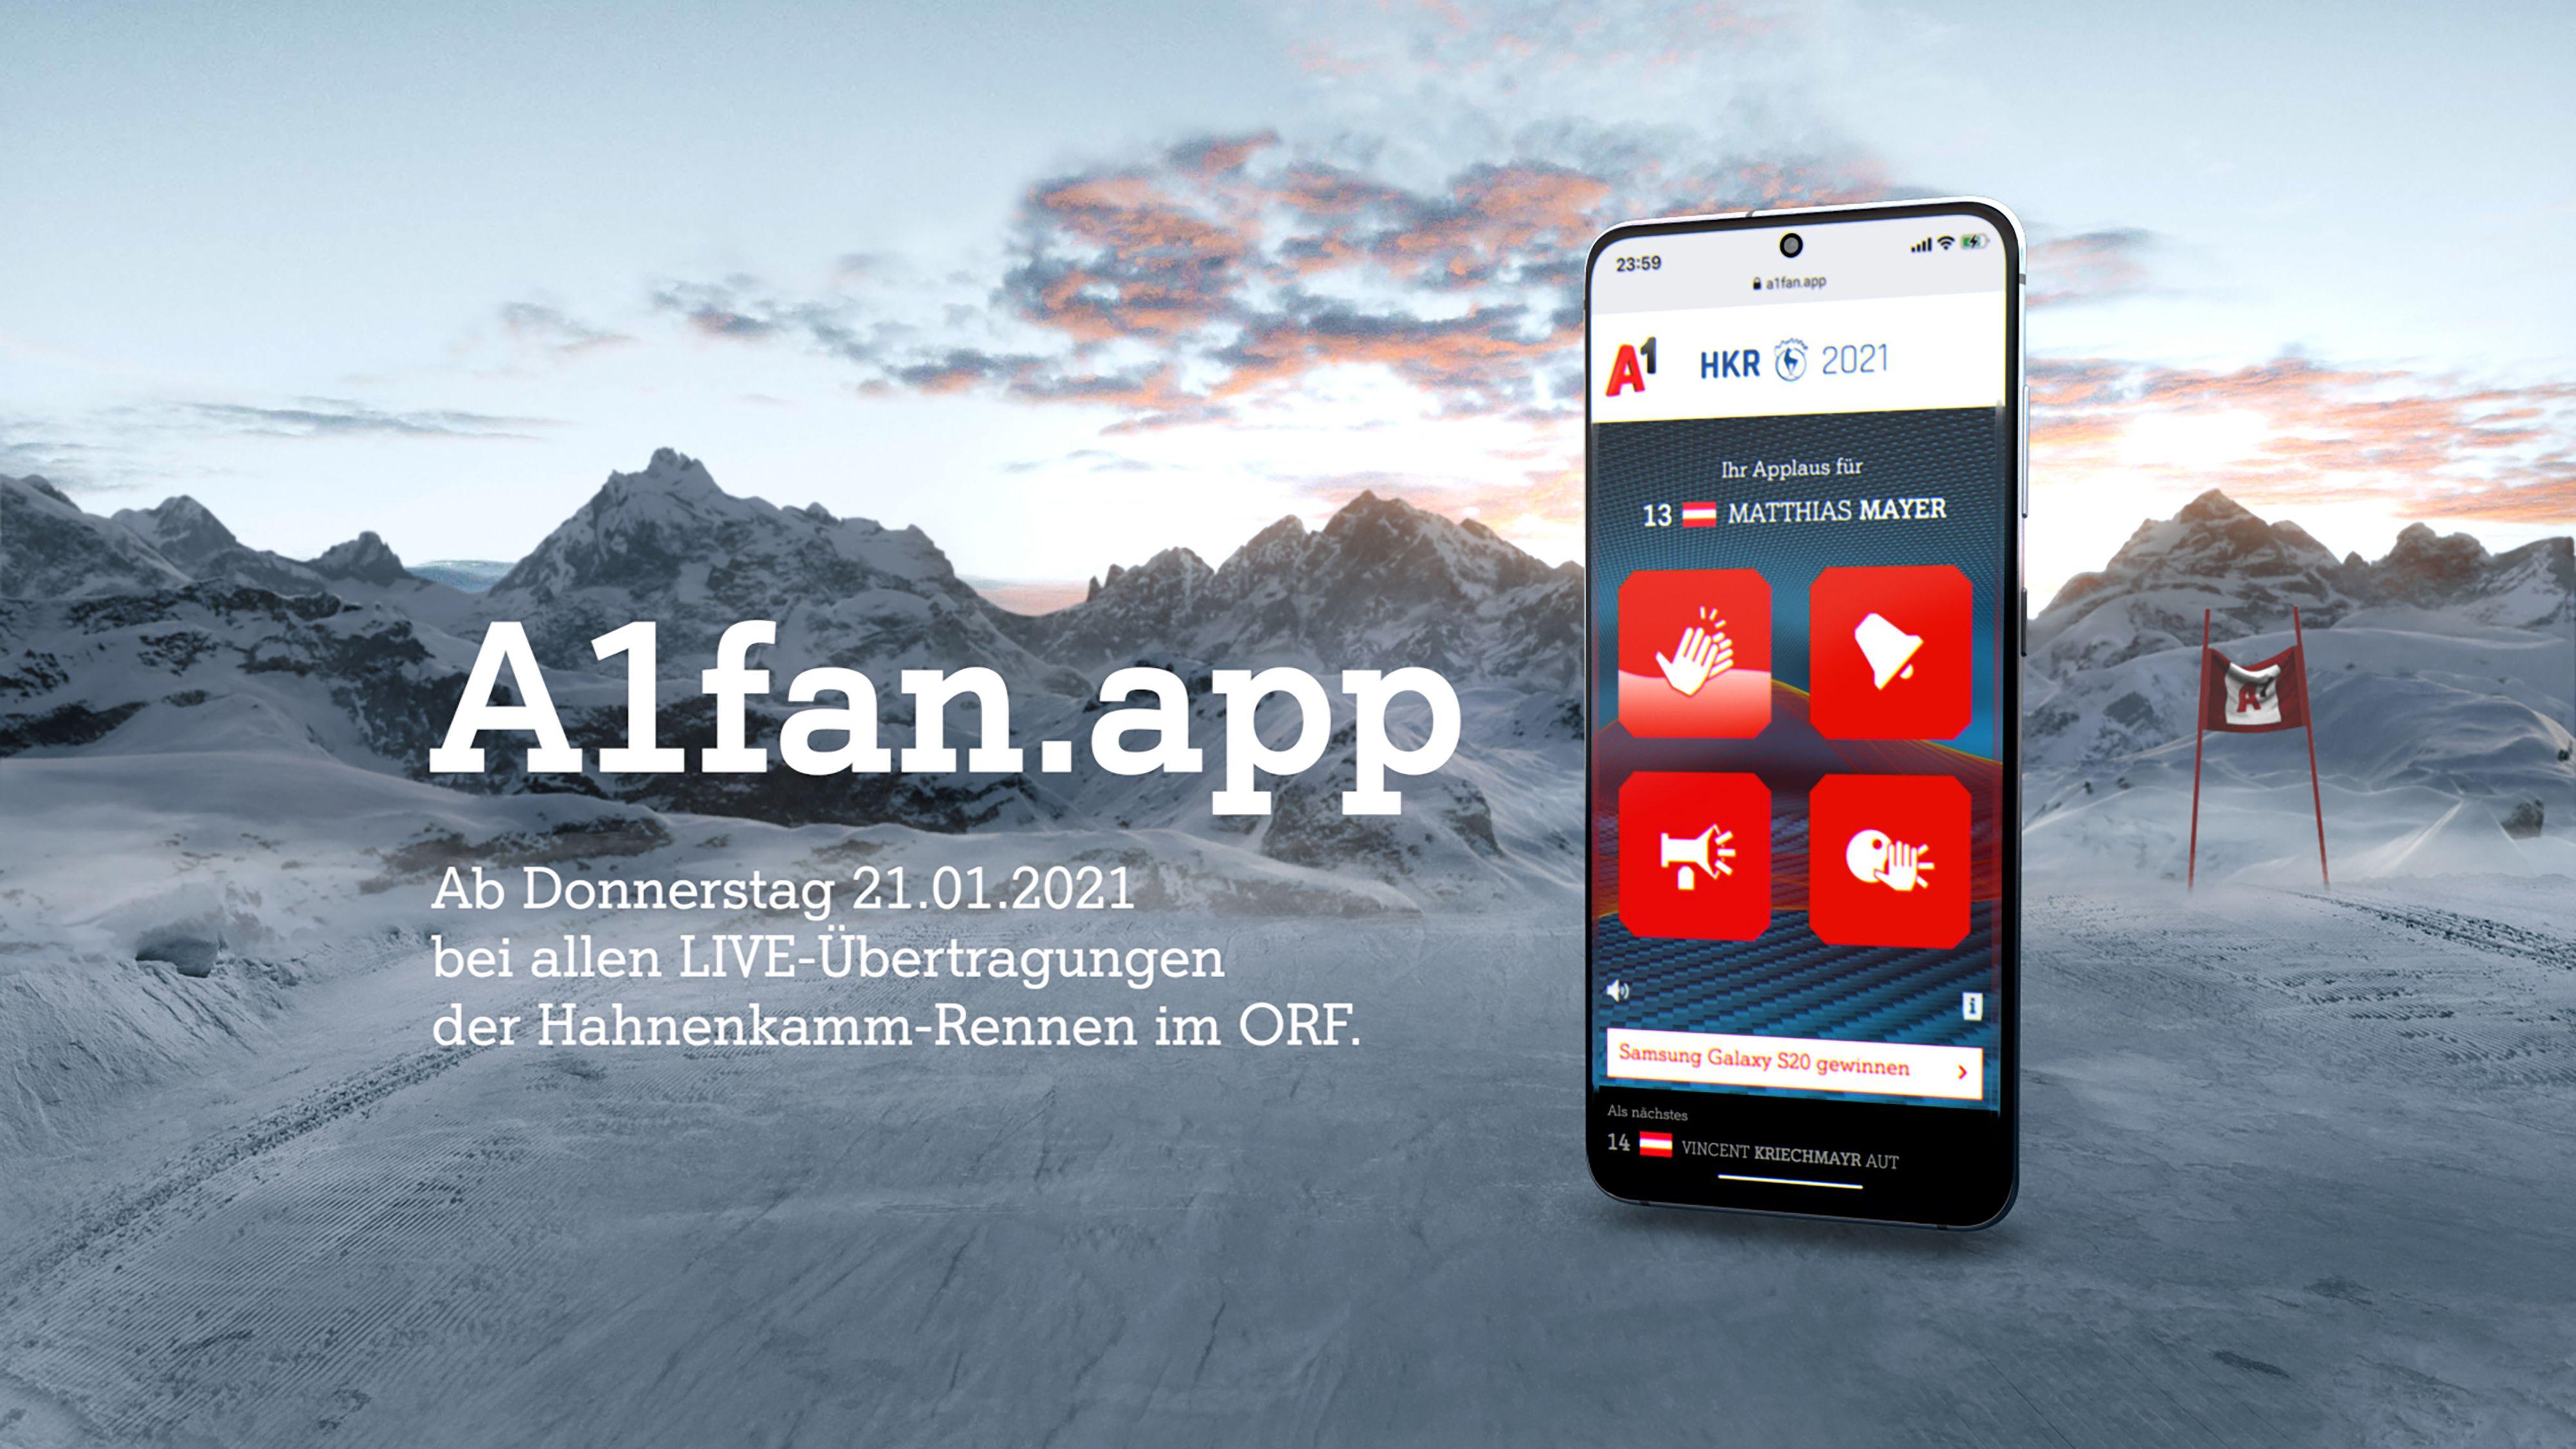 Visualisierung A1fan.app